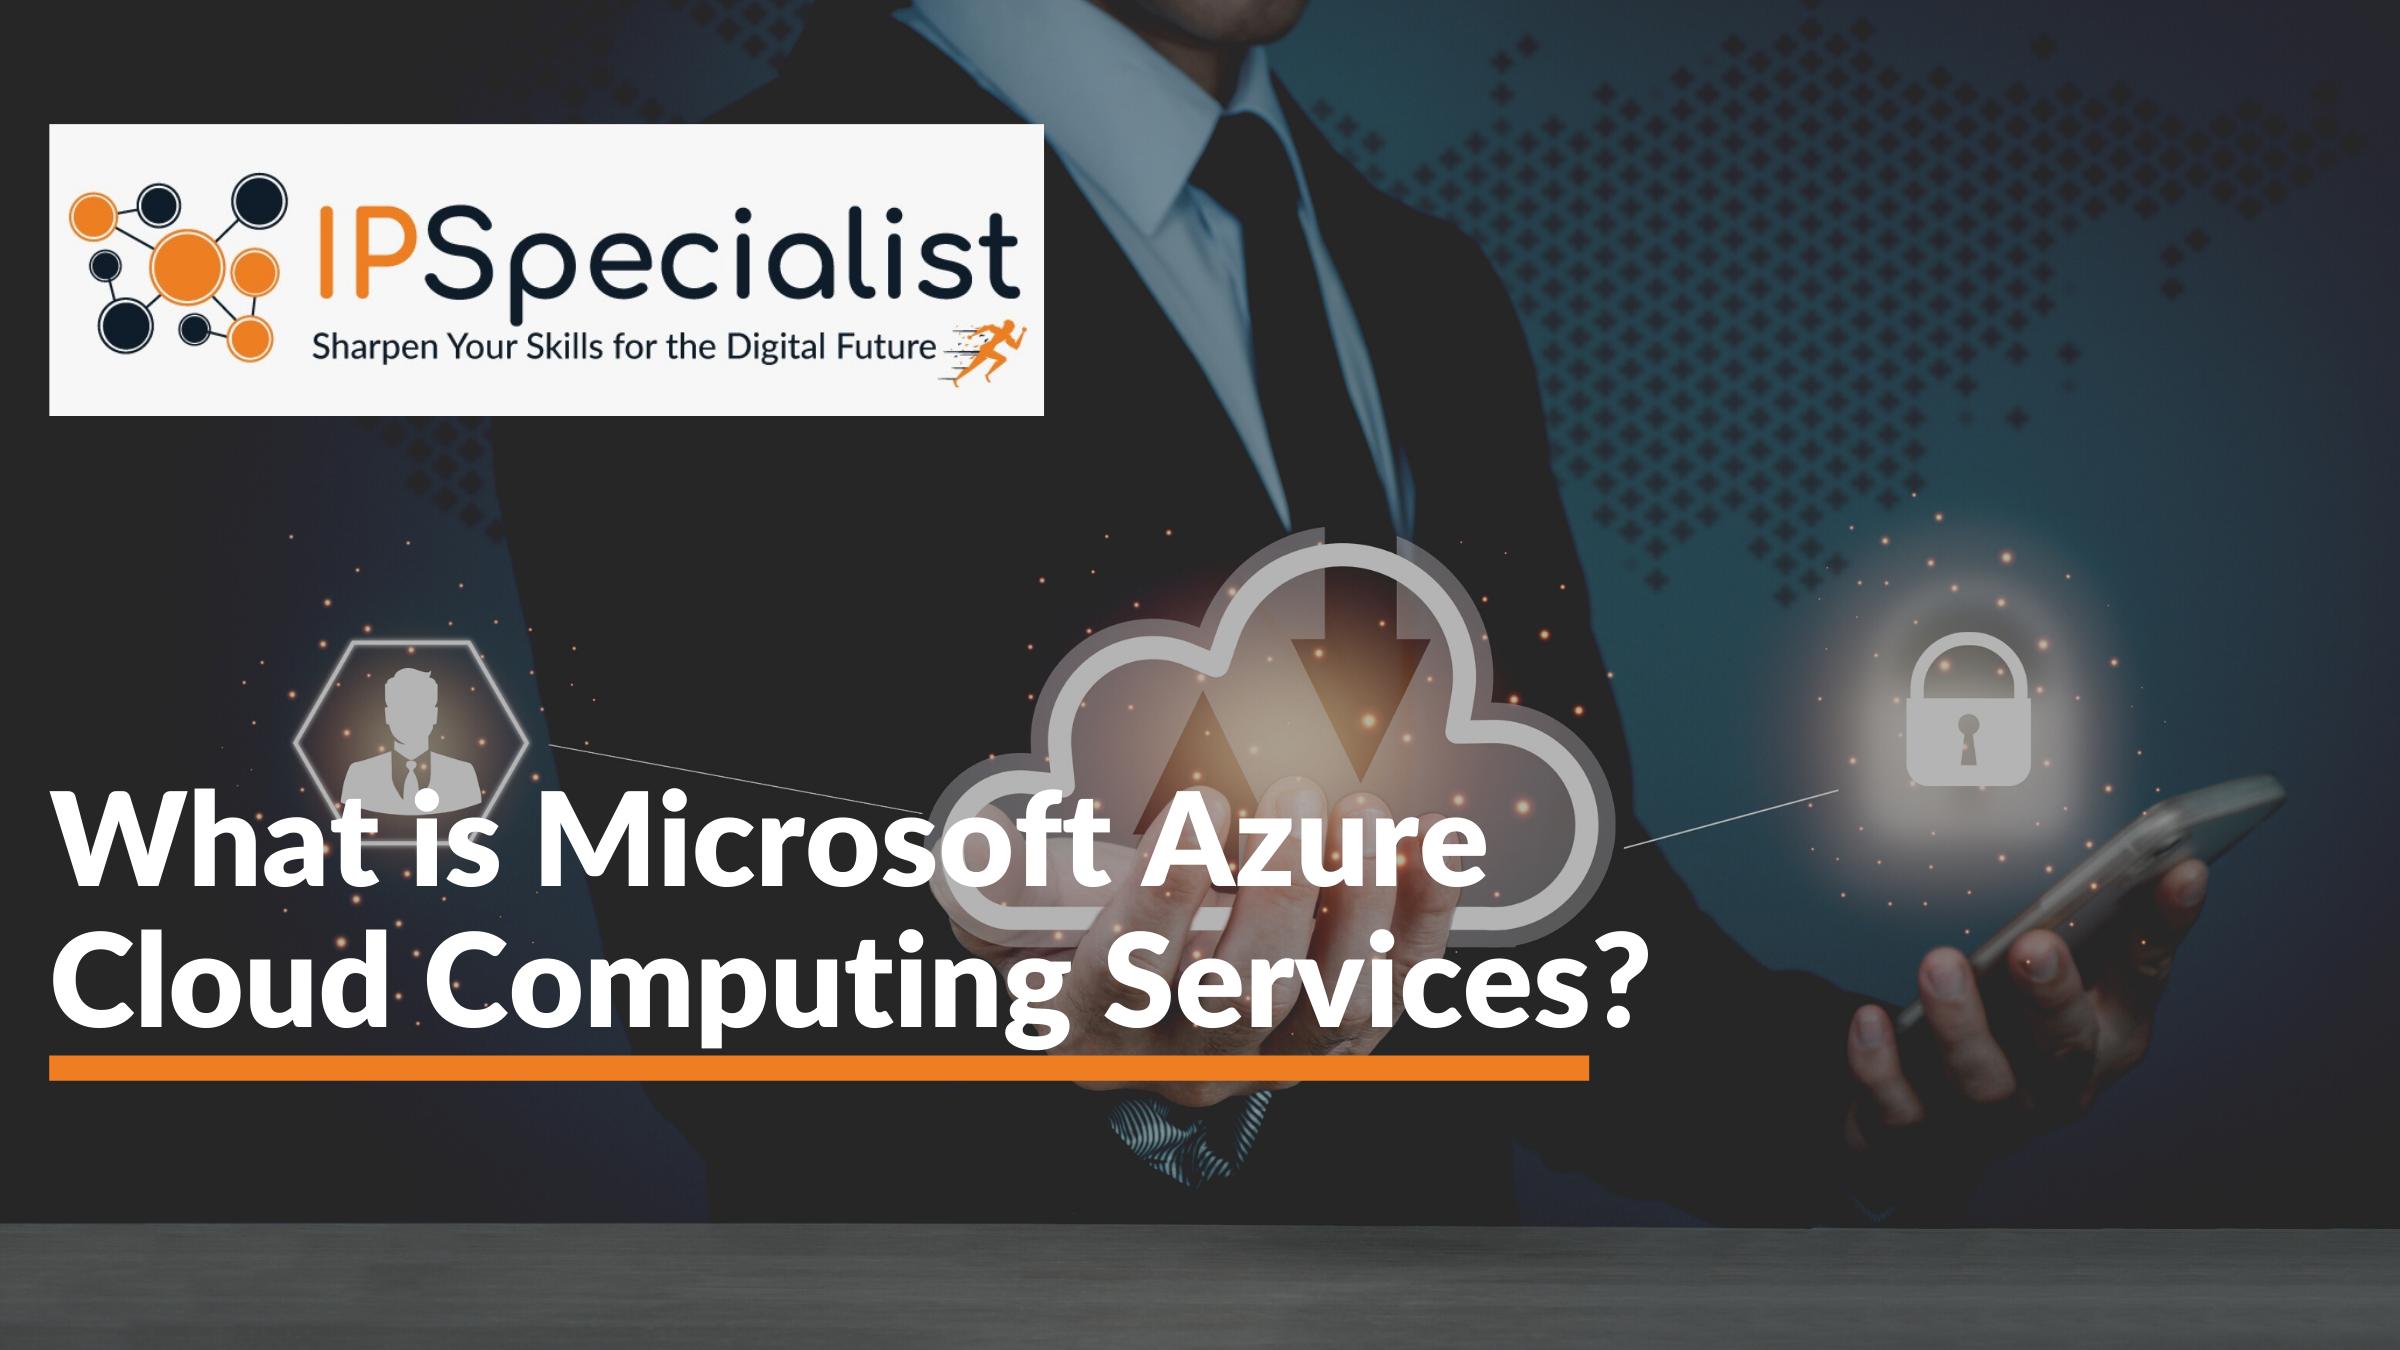 microsoft azure-Cloud computing